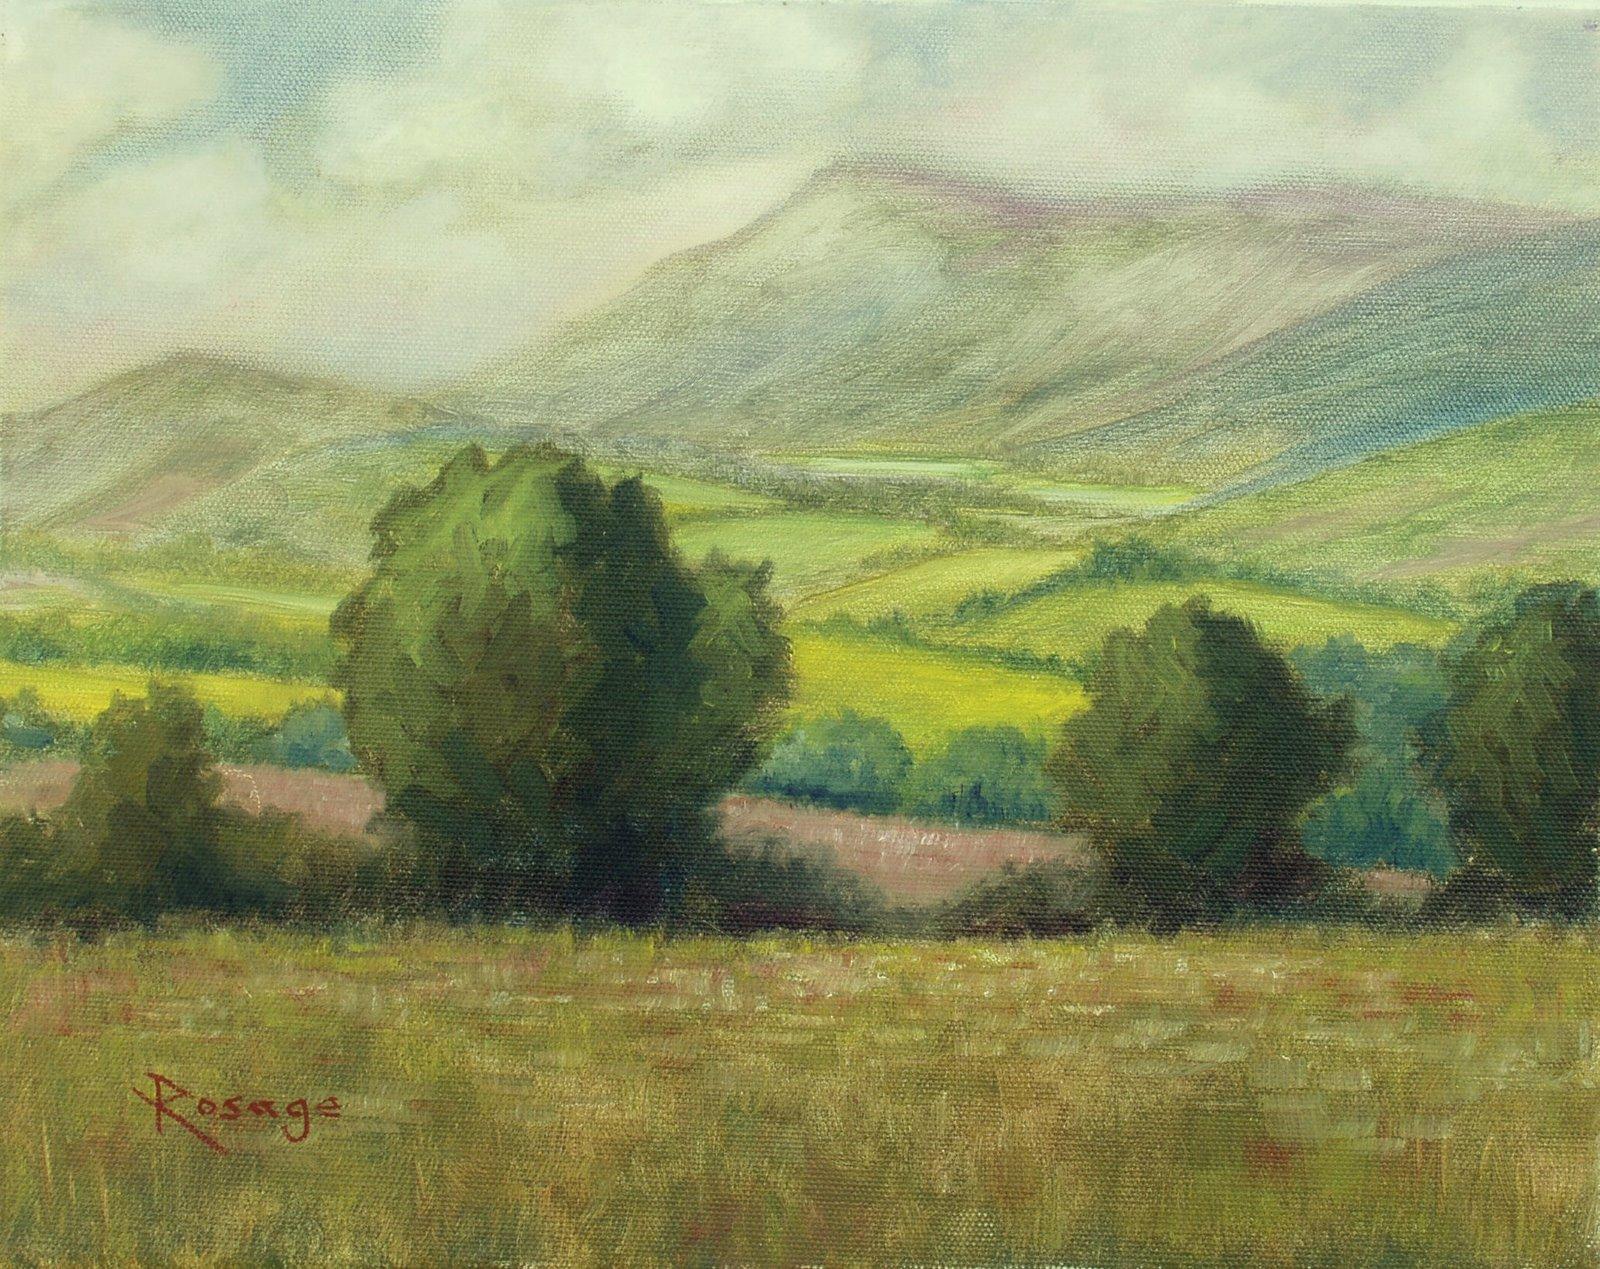 Artistic Release Alla Prima Paintings By Bernie Rosage Jr Ireland Landscape Painting By Bernie Rosage Jr Available Now